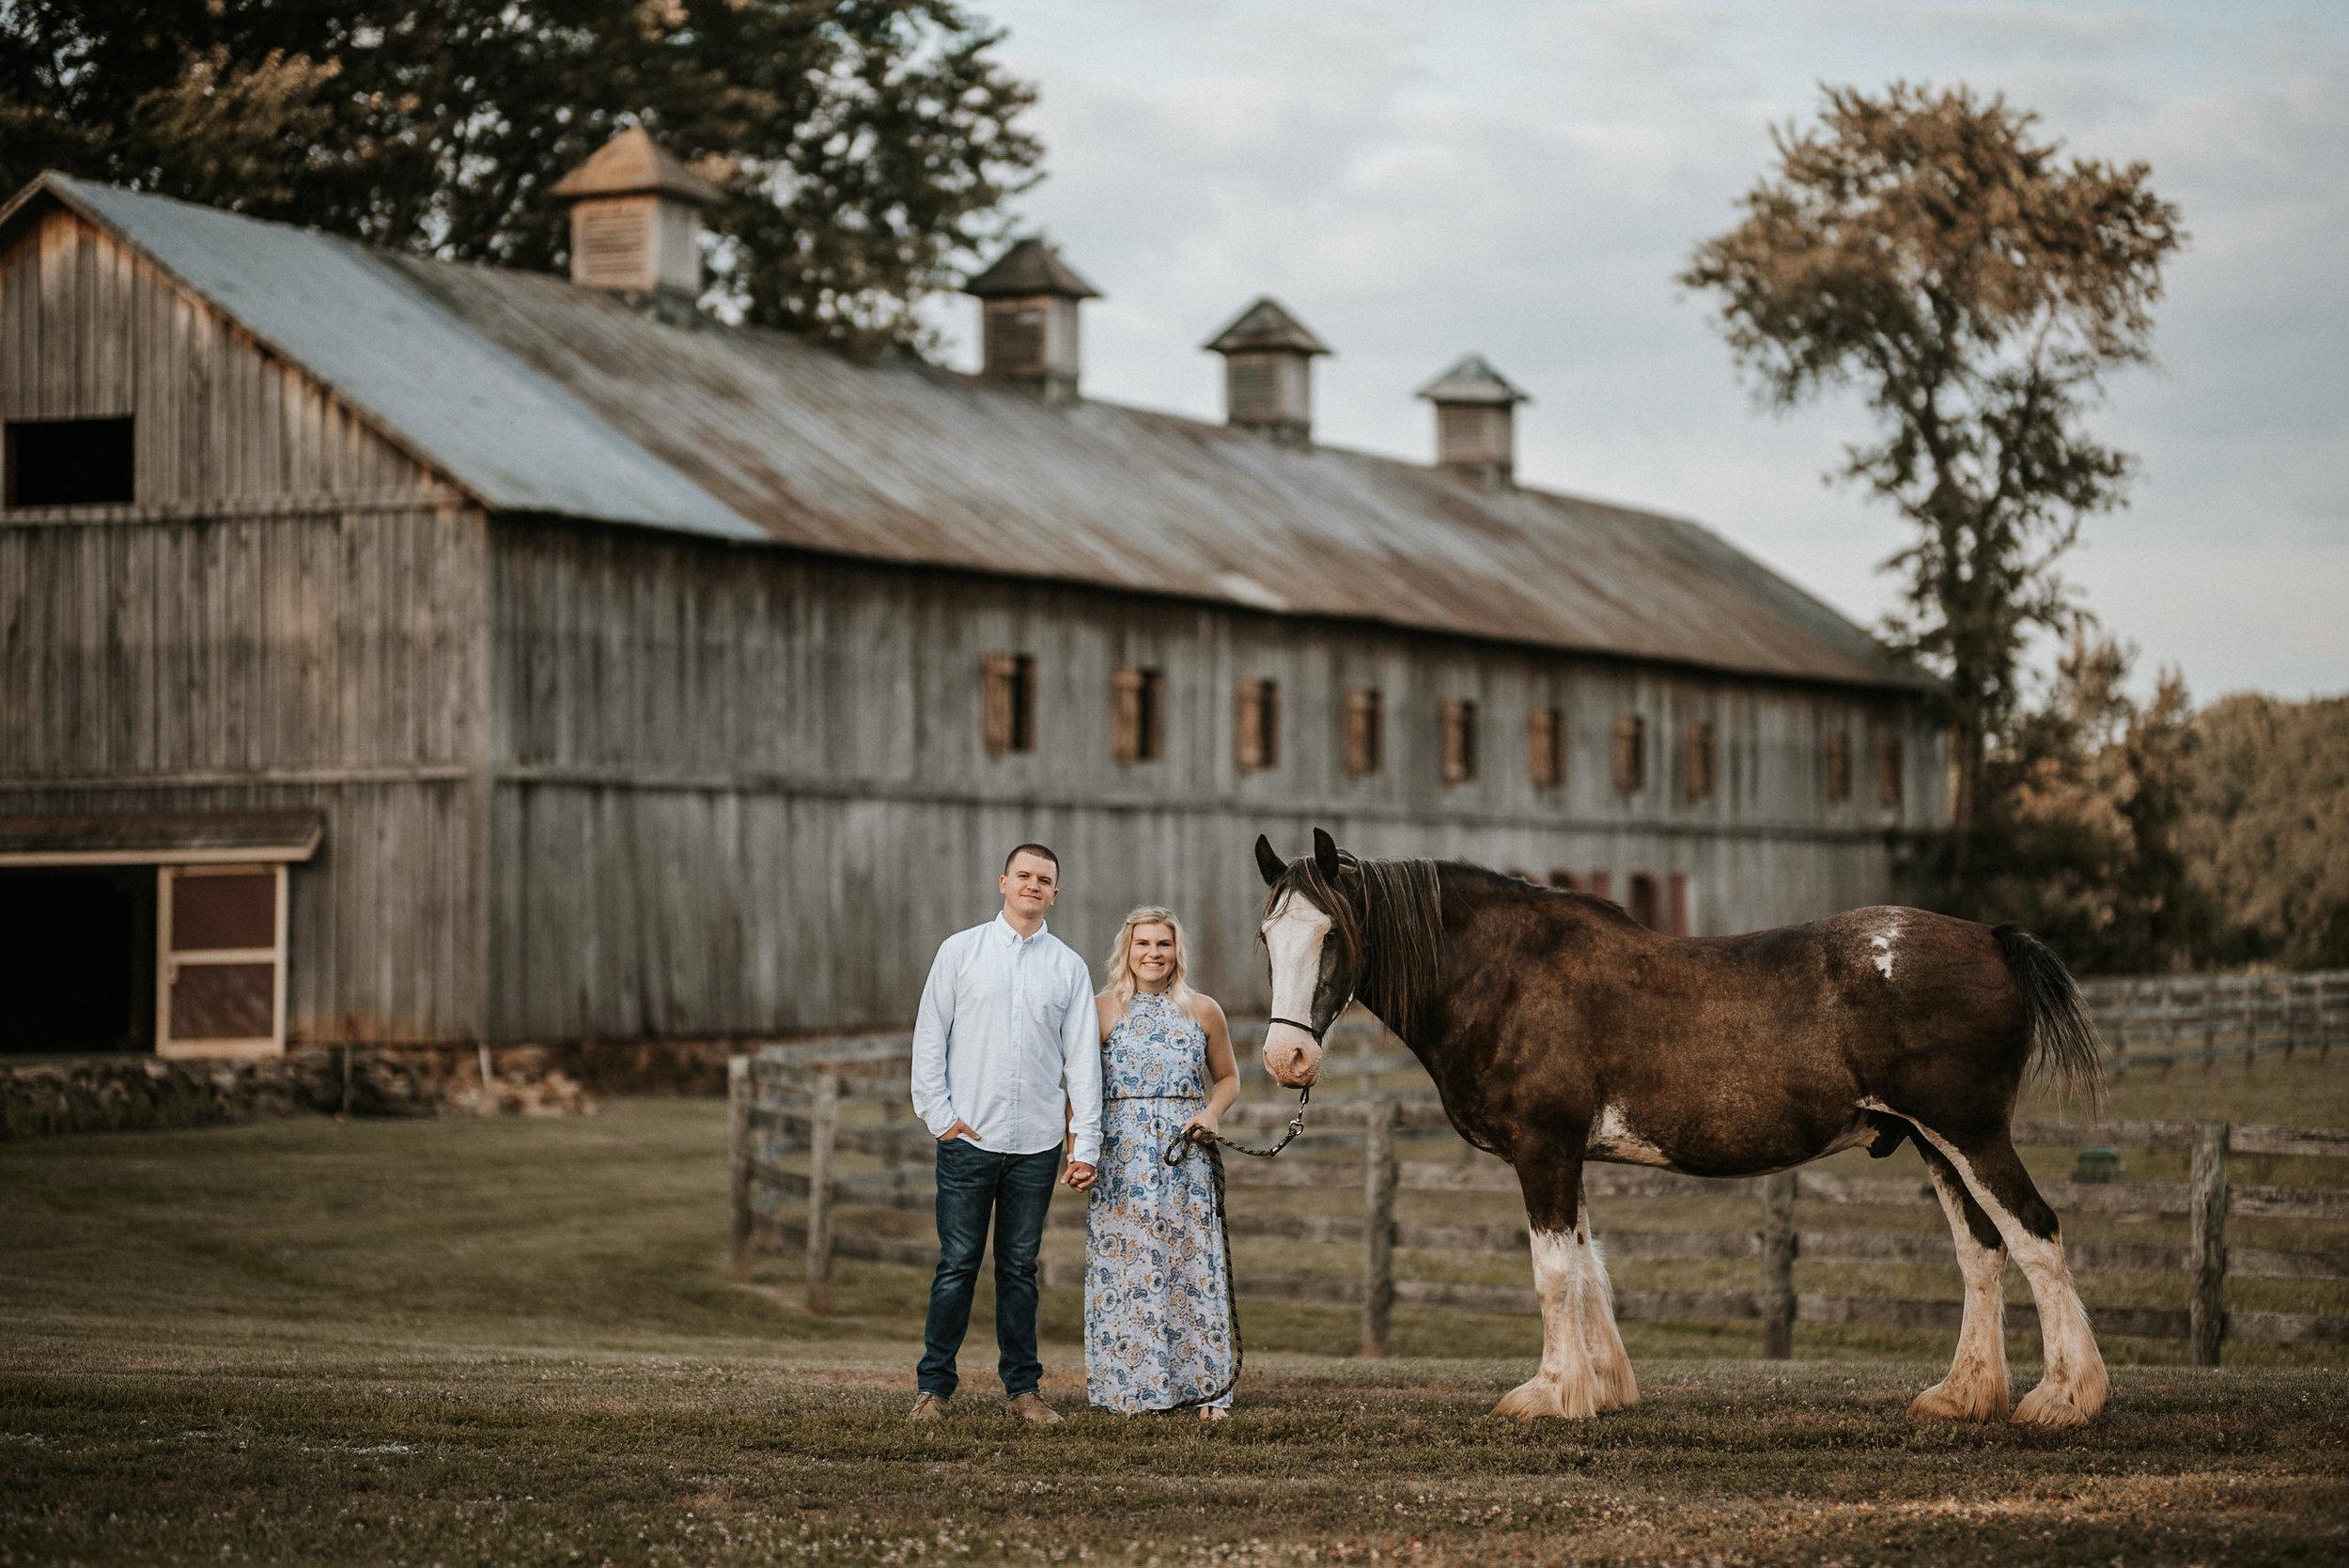 sylvanside farm engagement photo